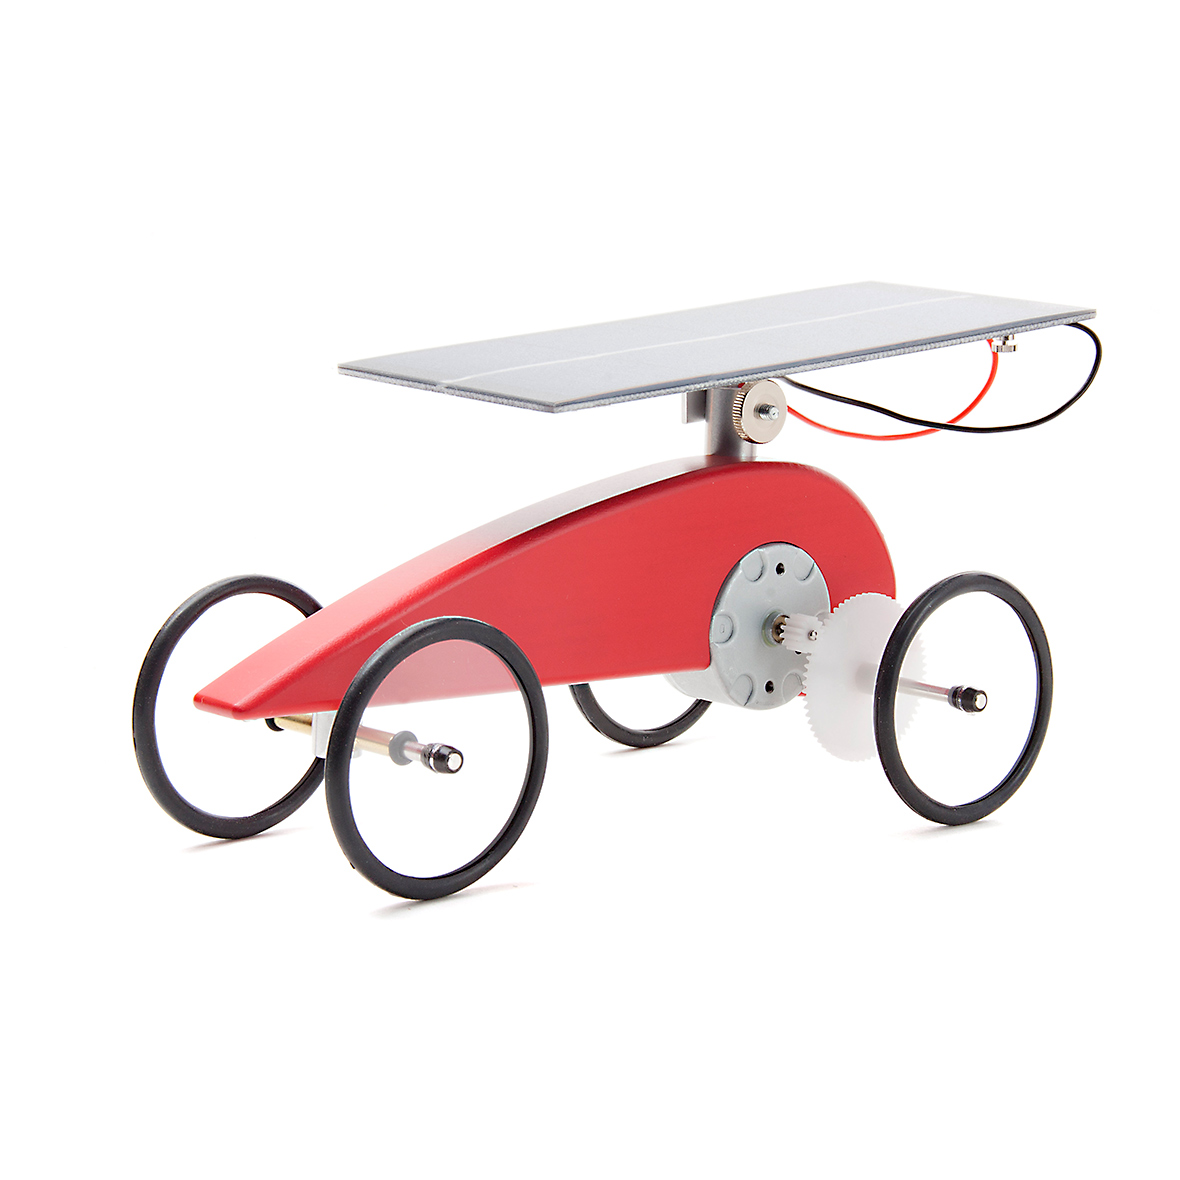 Solar-Holzauto-Bausatz Mouvelette